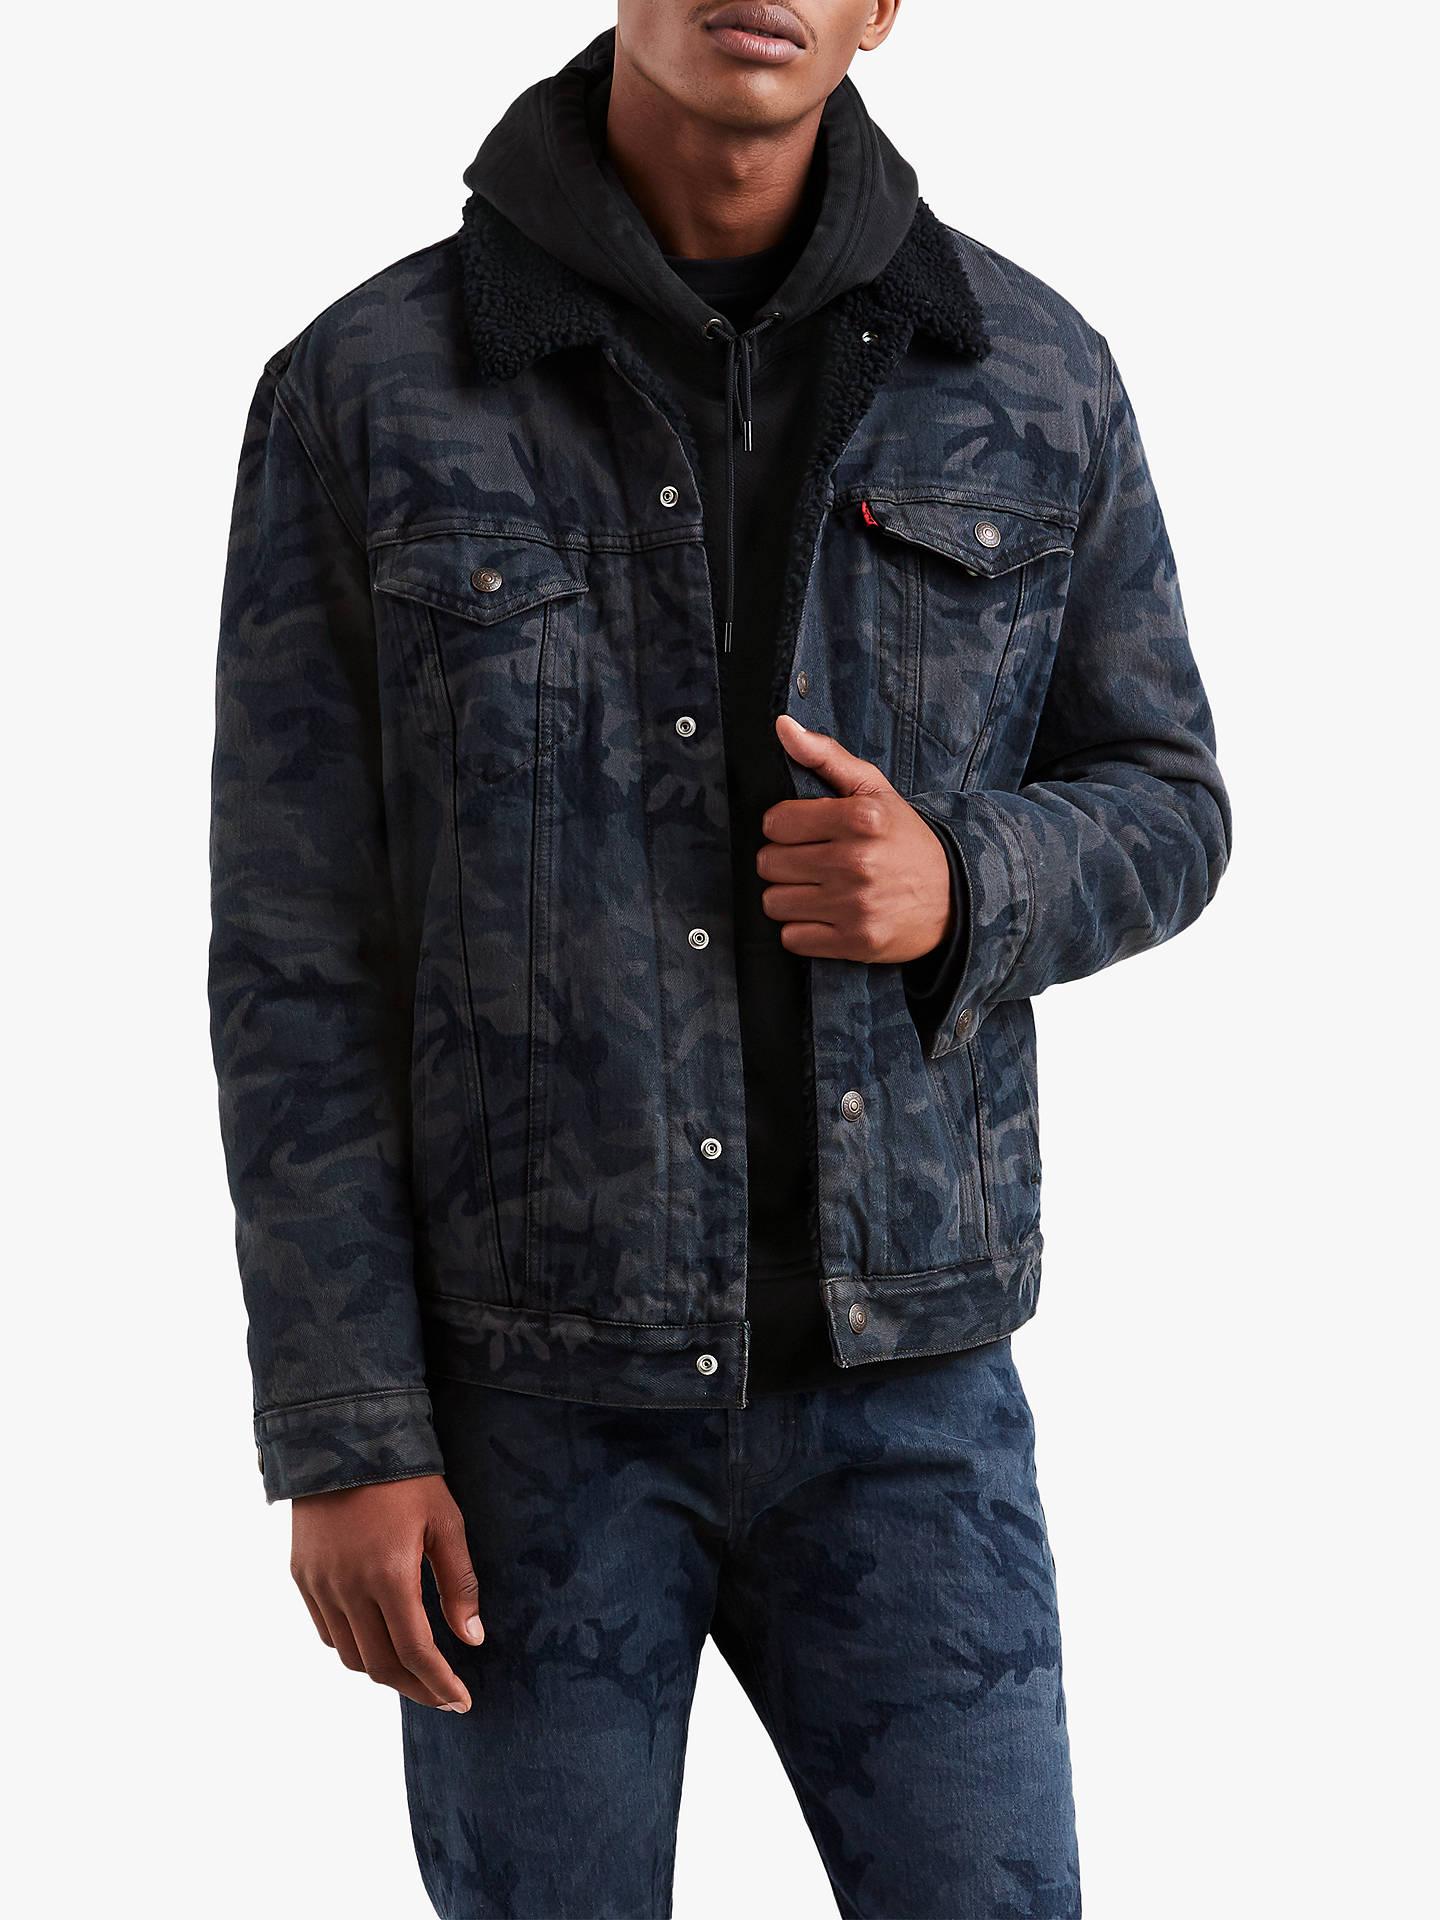 c18d663ab46d0 Buy Levi's x Justin Timberlake Sherpa Camo Trucker Jacket, Black Camo, M  Online at ...